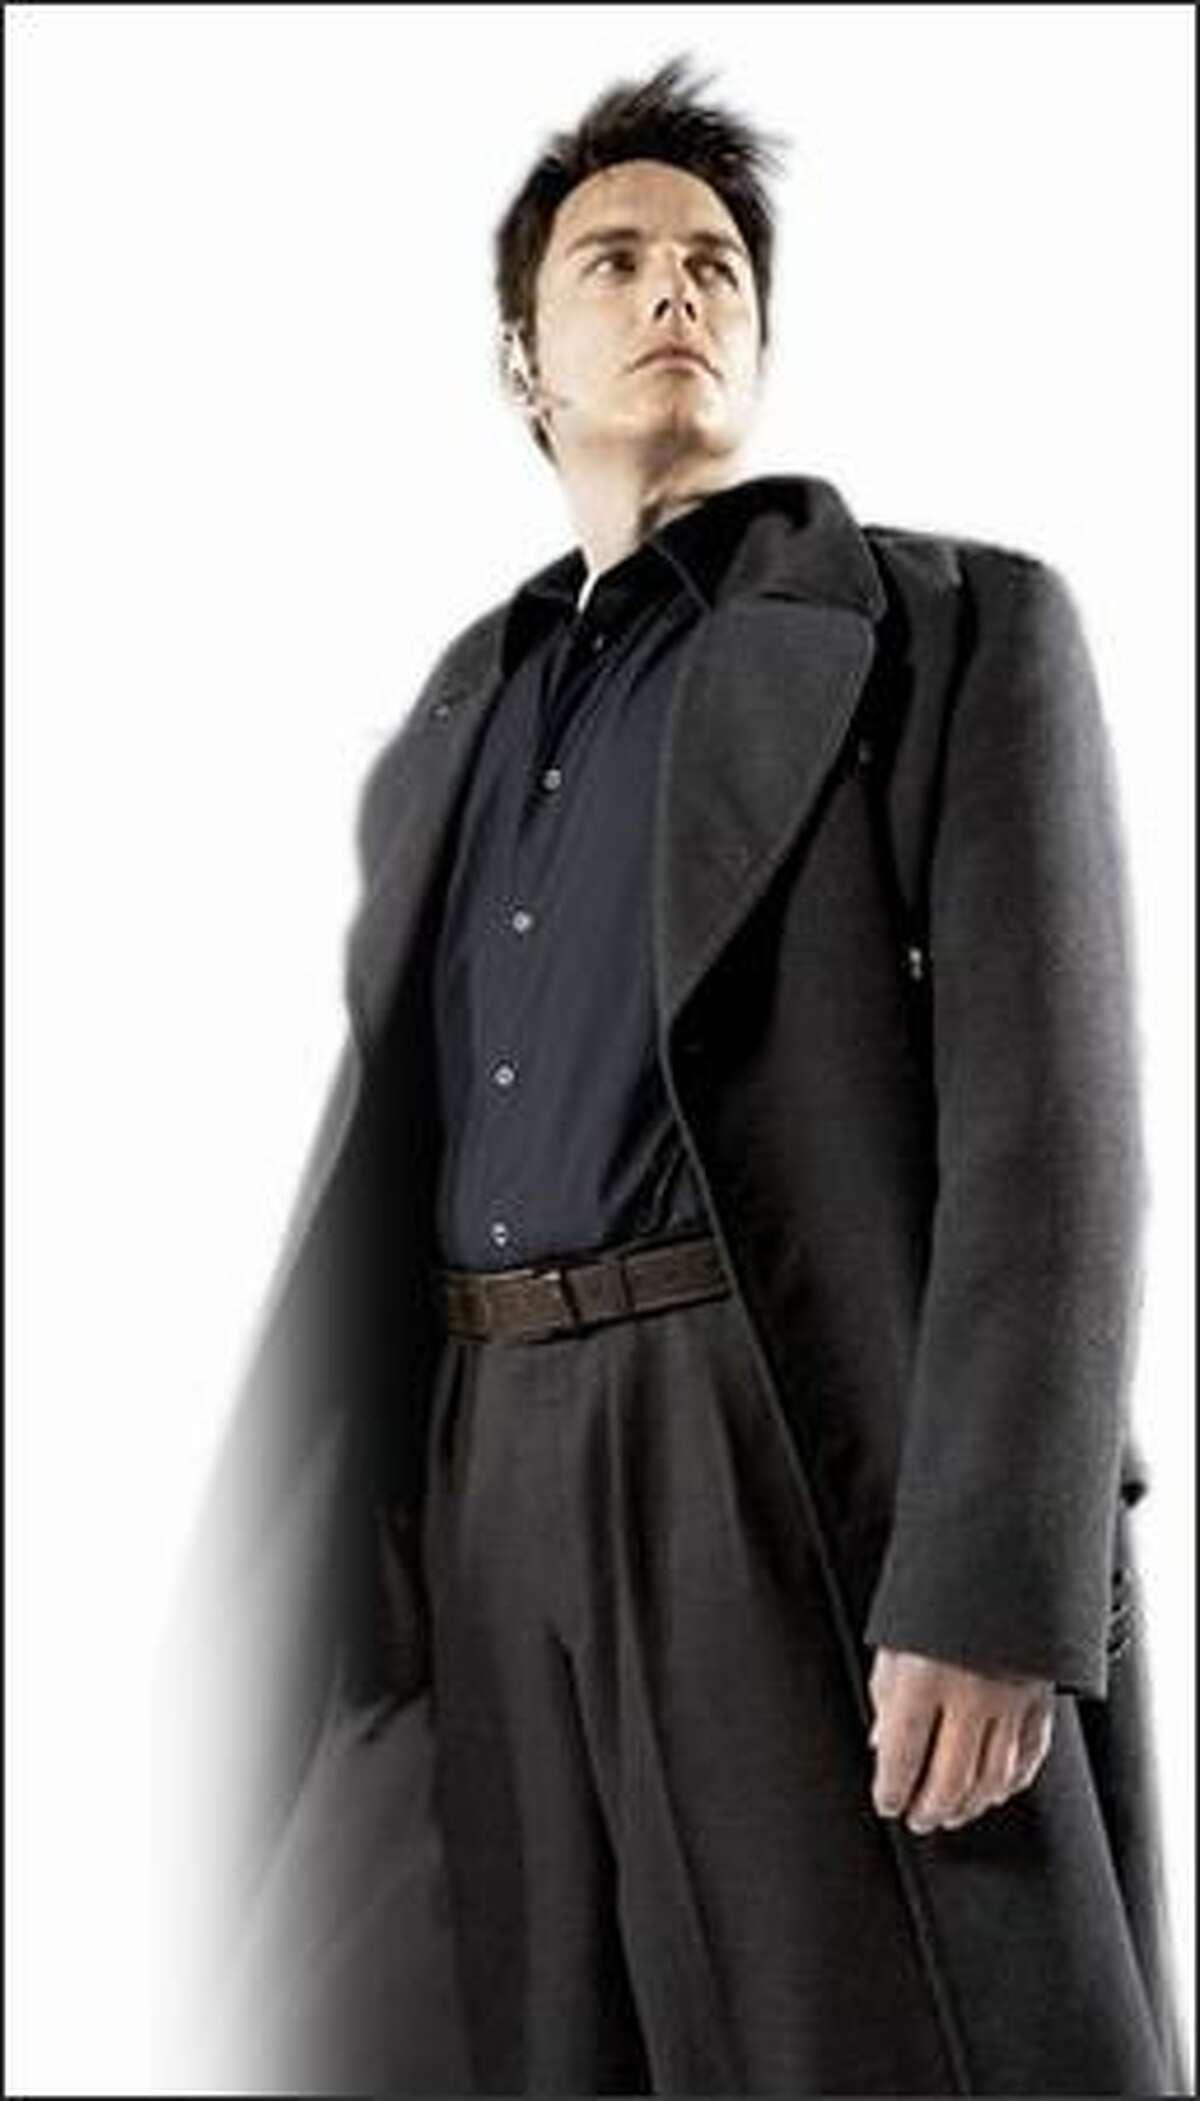 Captain Jack Harkness (John Barrowman) stands tall on